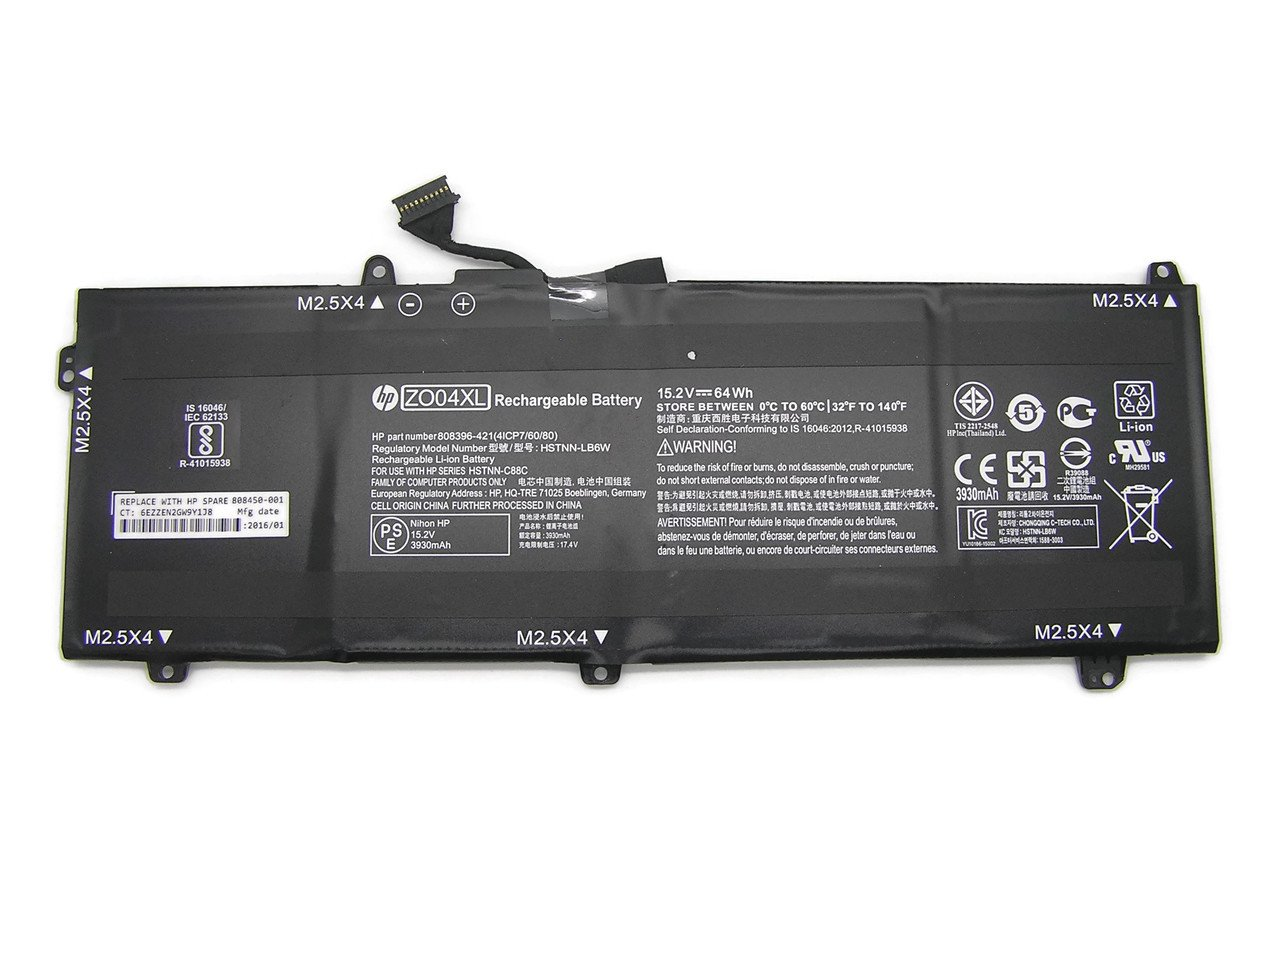 New Genuine Battery For HP ZBook Studio G3 Mobil Series 15.2V 64Wh Battery 808450-002